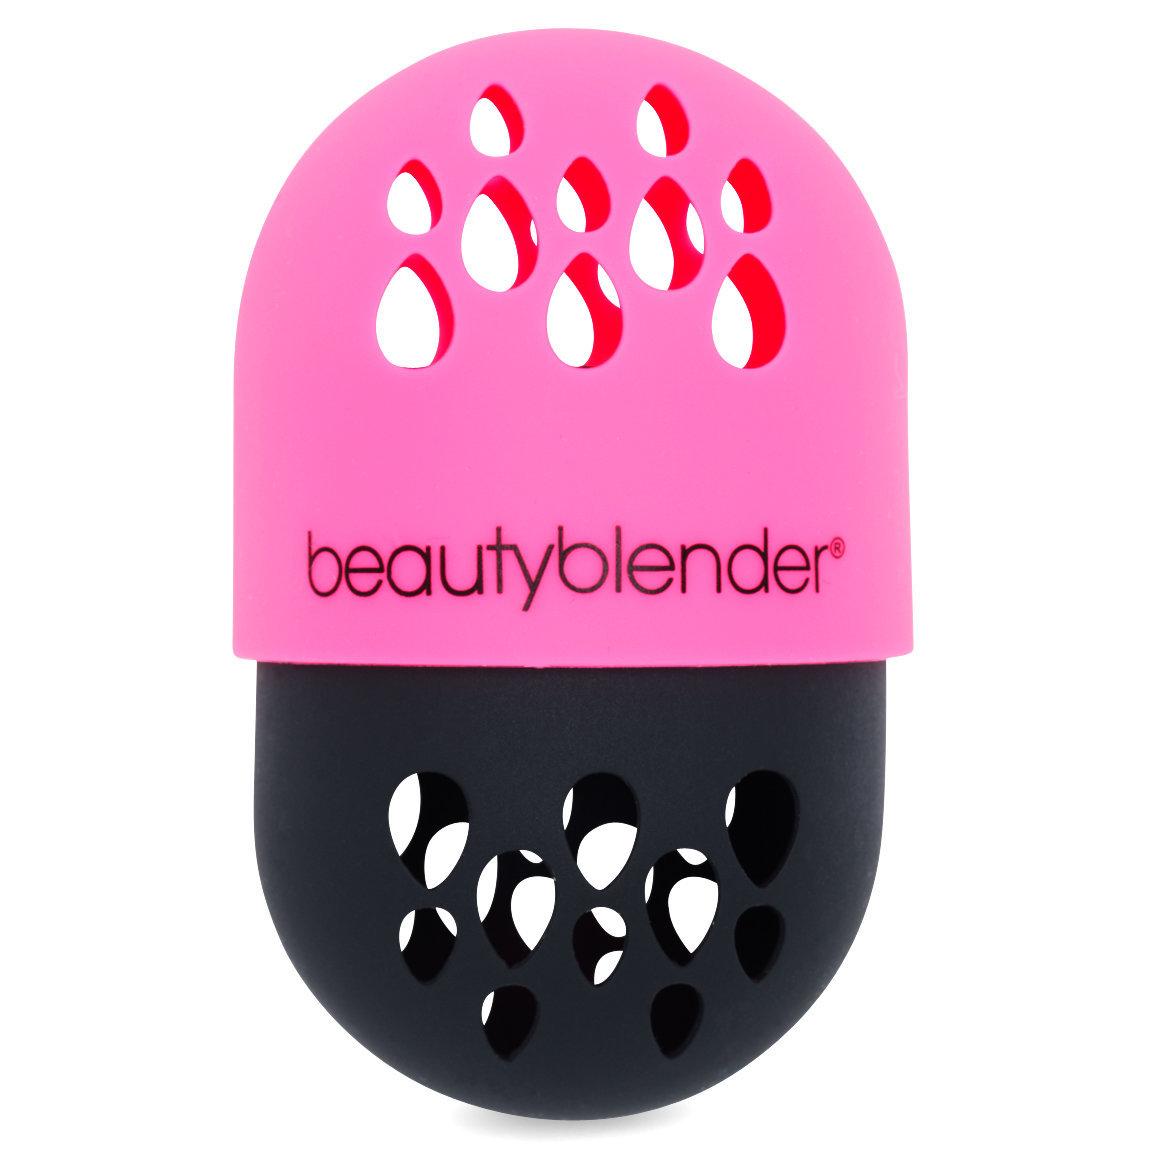 beautyblender blenderdefender alternative view 1 - product swatch.